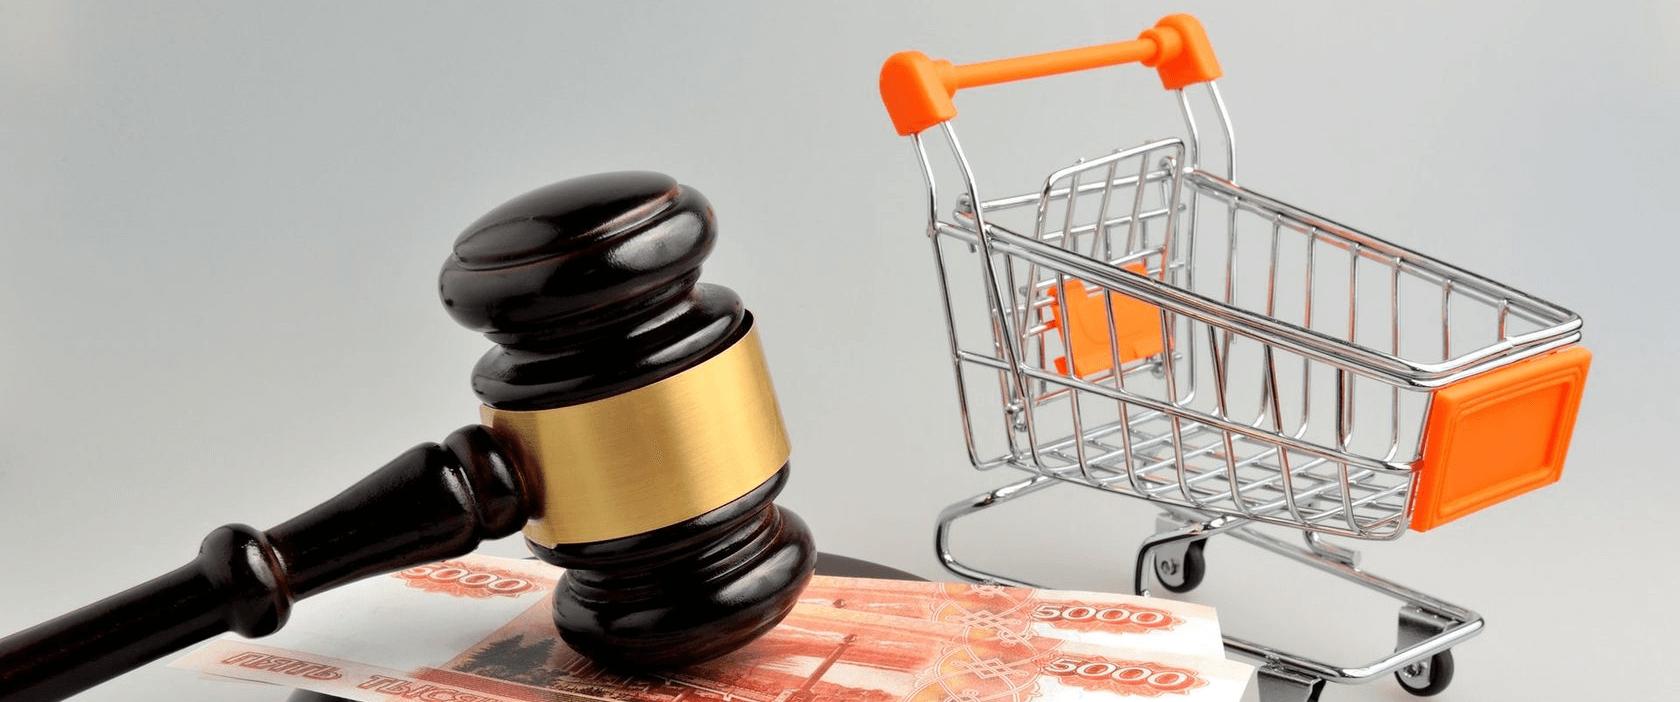 консультация юриста по защите прав потребителей